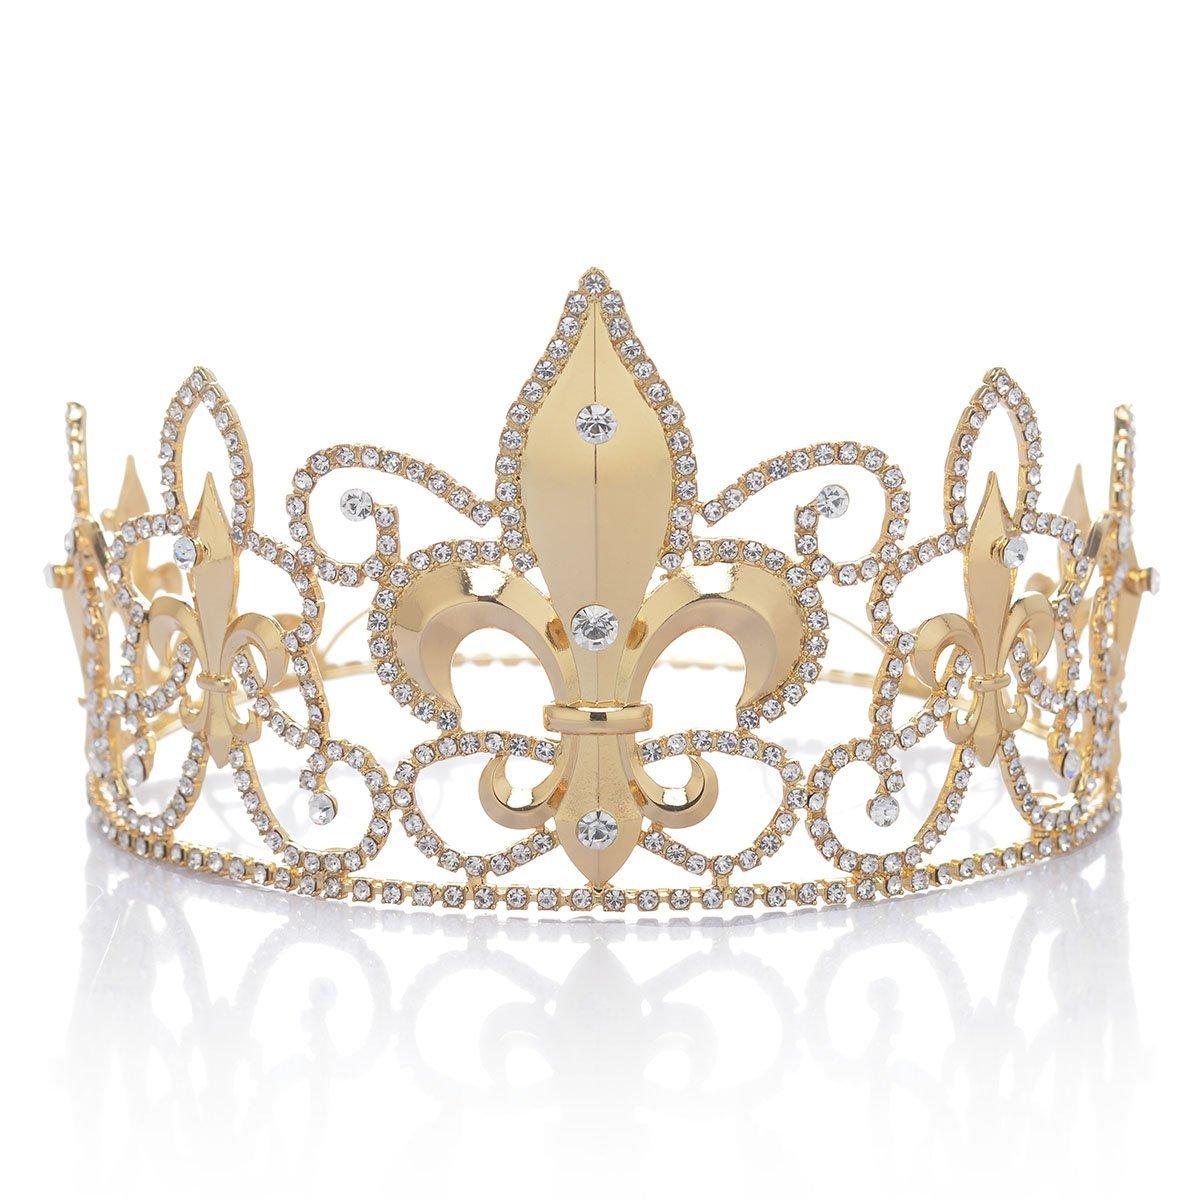 Remedios Fleur-de-lis Crystal Men's Crown Tiara Rhinestone King's Crown Tiara Headpieces, Gold